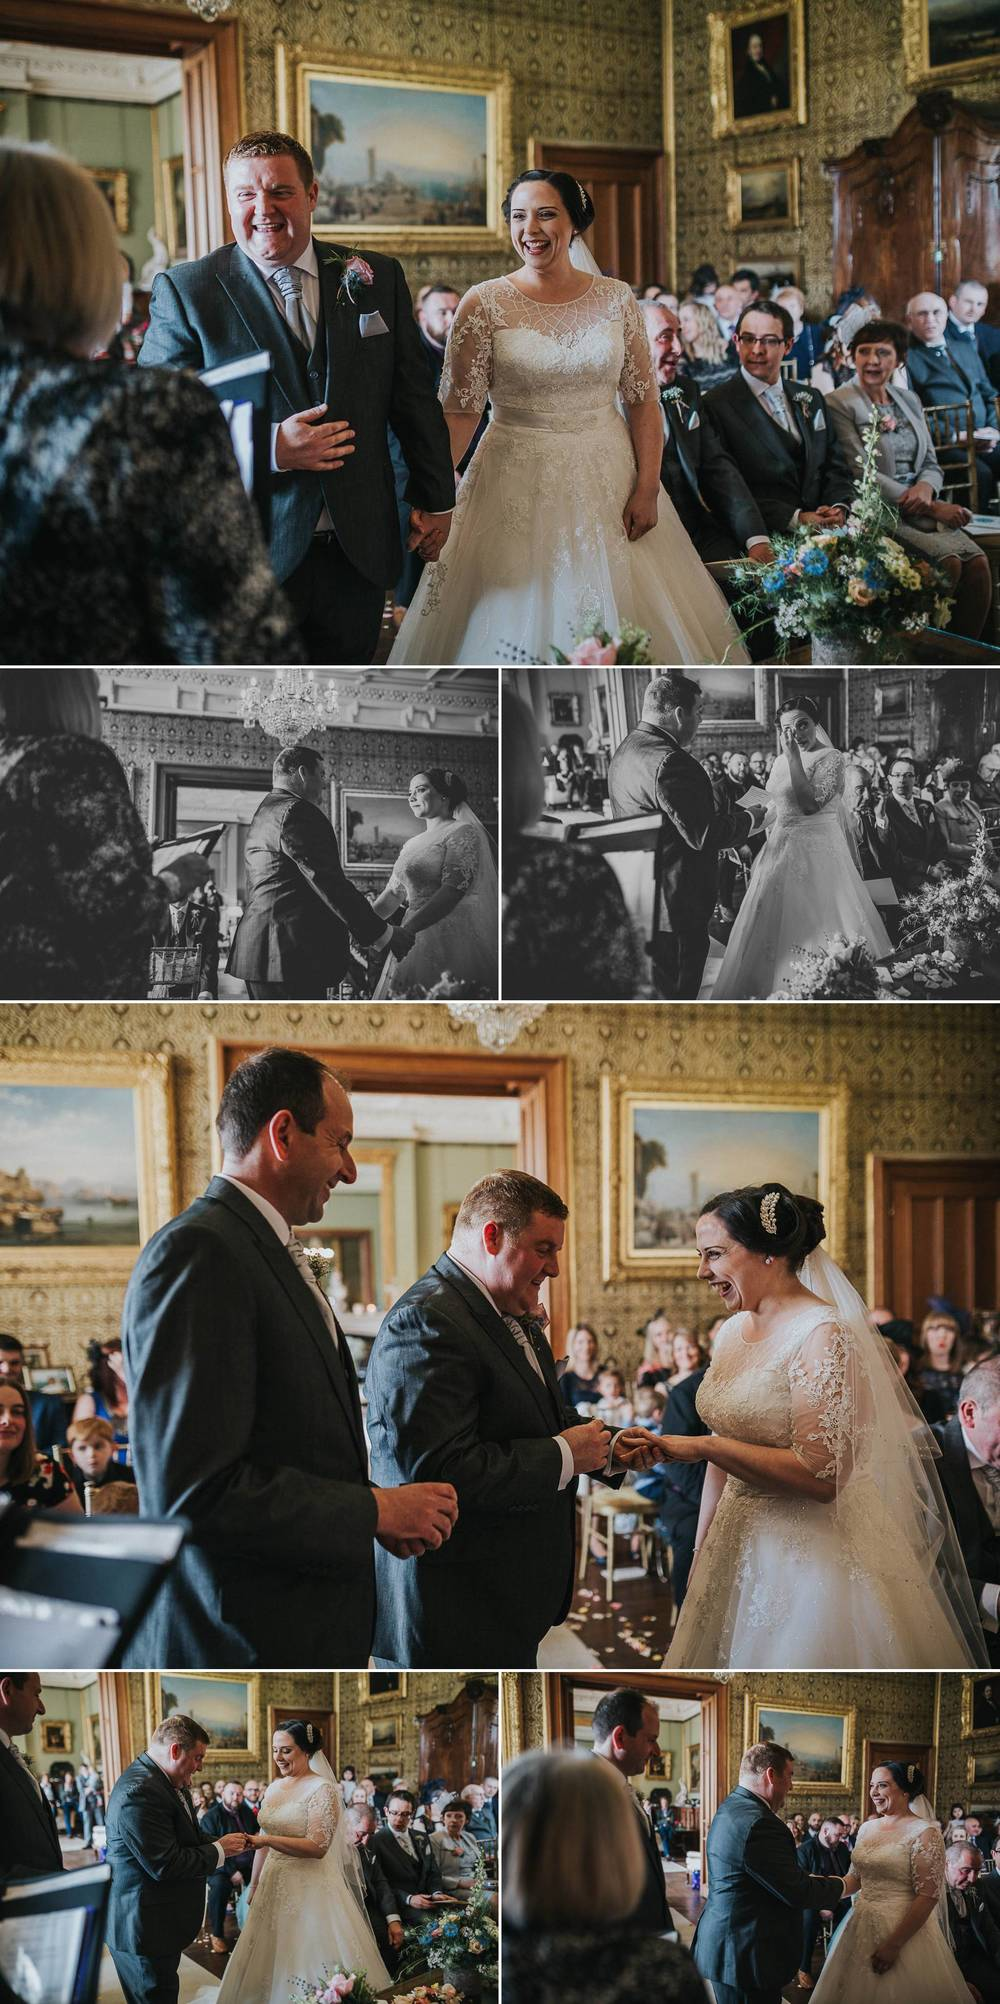 wedding-photographer-staffordshire 11.jpg